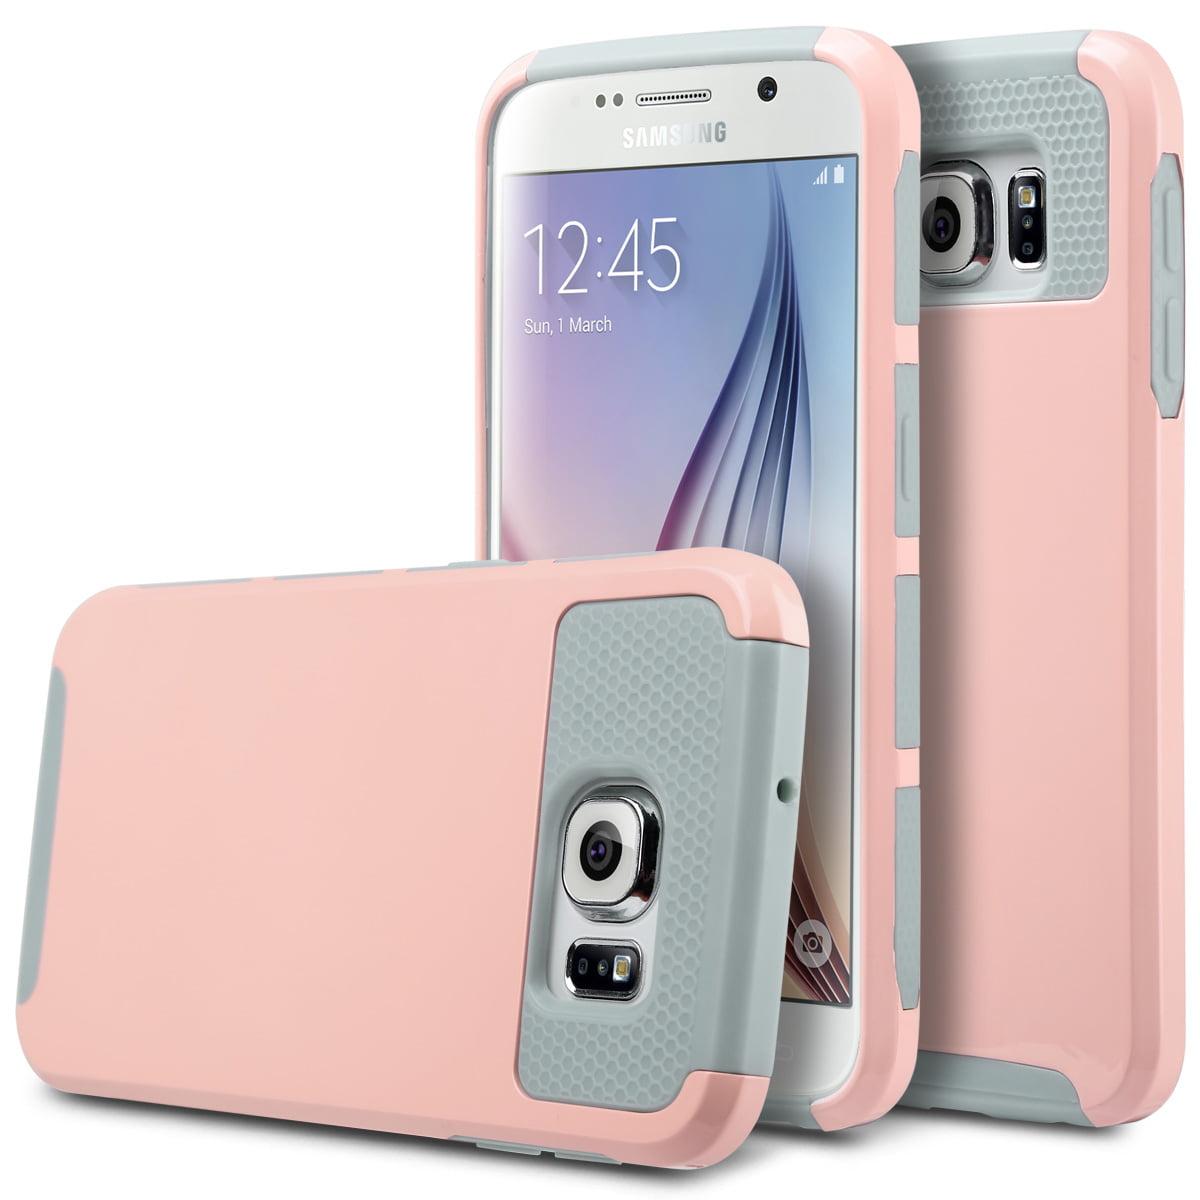 online retailer a8af5 c4862 ULAK Galaxy S6 Case, 2in1 Hybrid Rubber Matte Slim Hard Case Cover ...